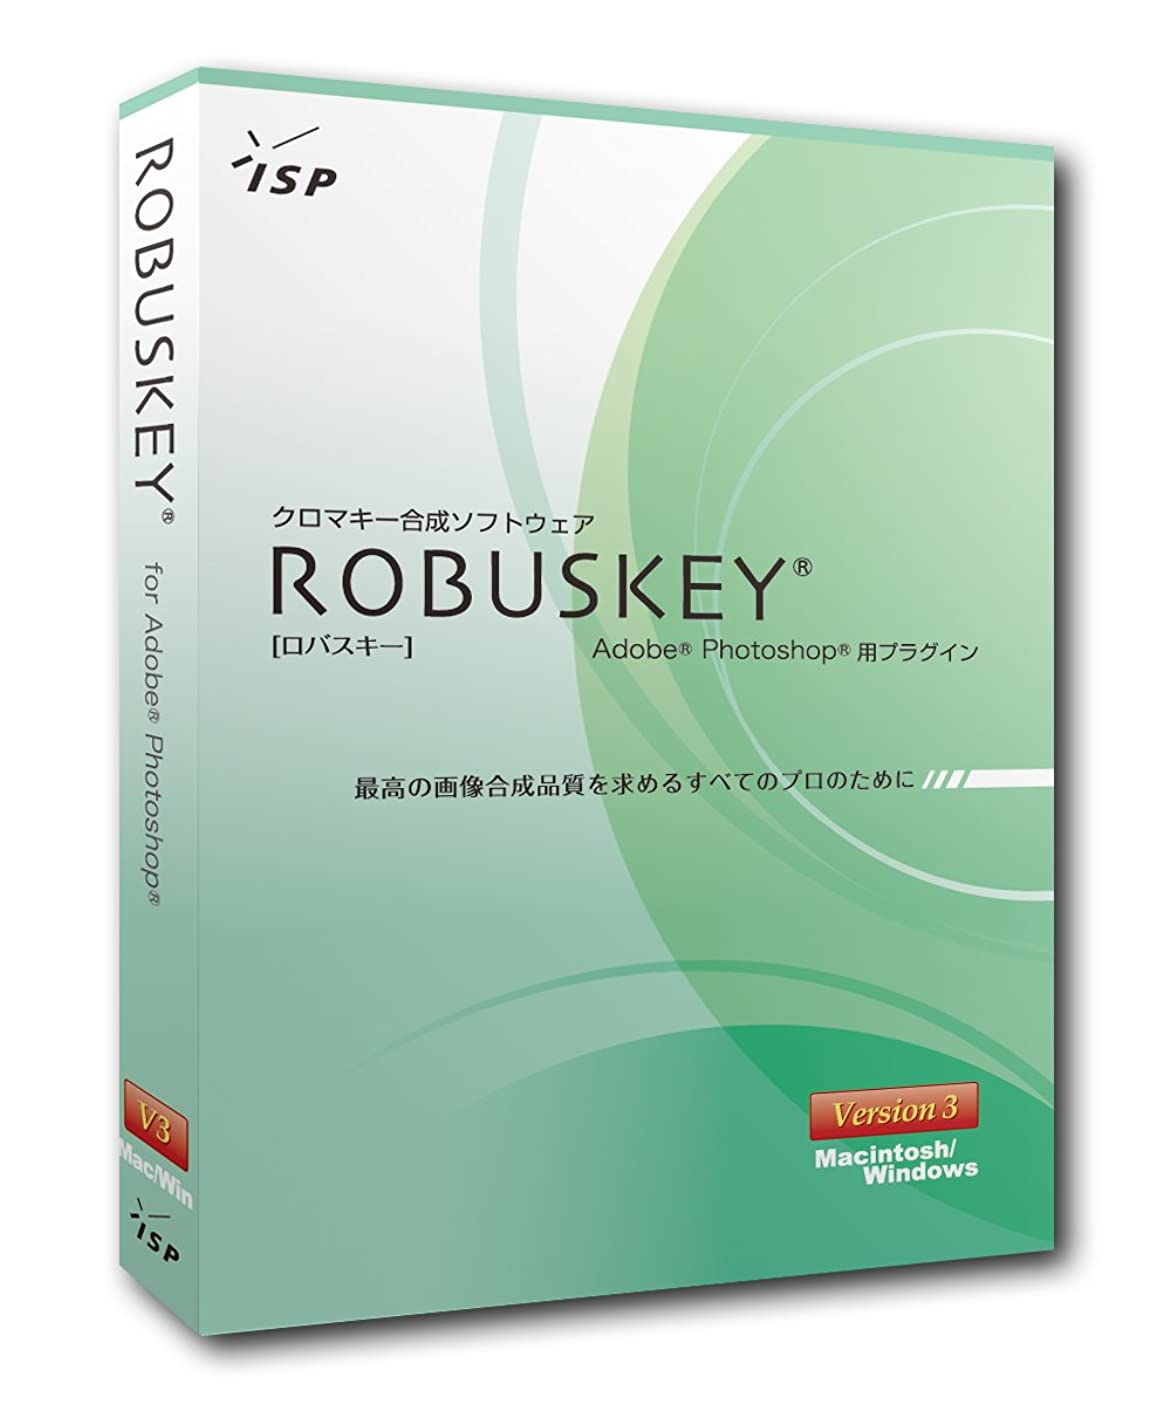 複合生命体洗剤ROBUSKEY for Adobe Photoshop Version 3.2 Macintosh/Windows版